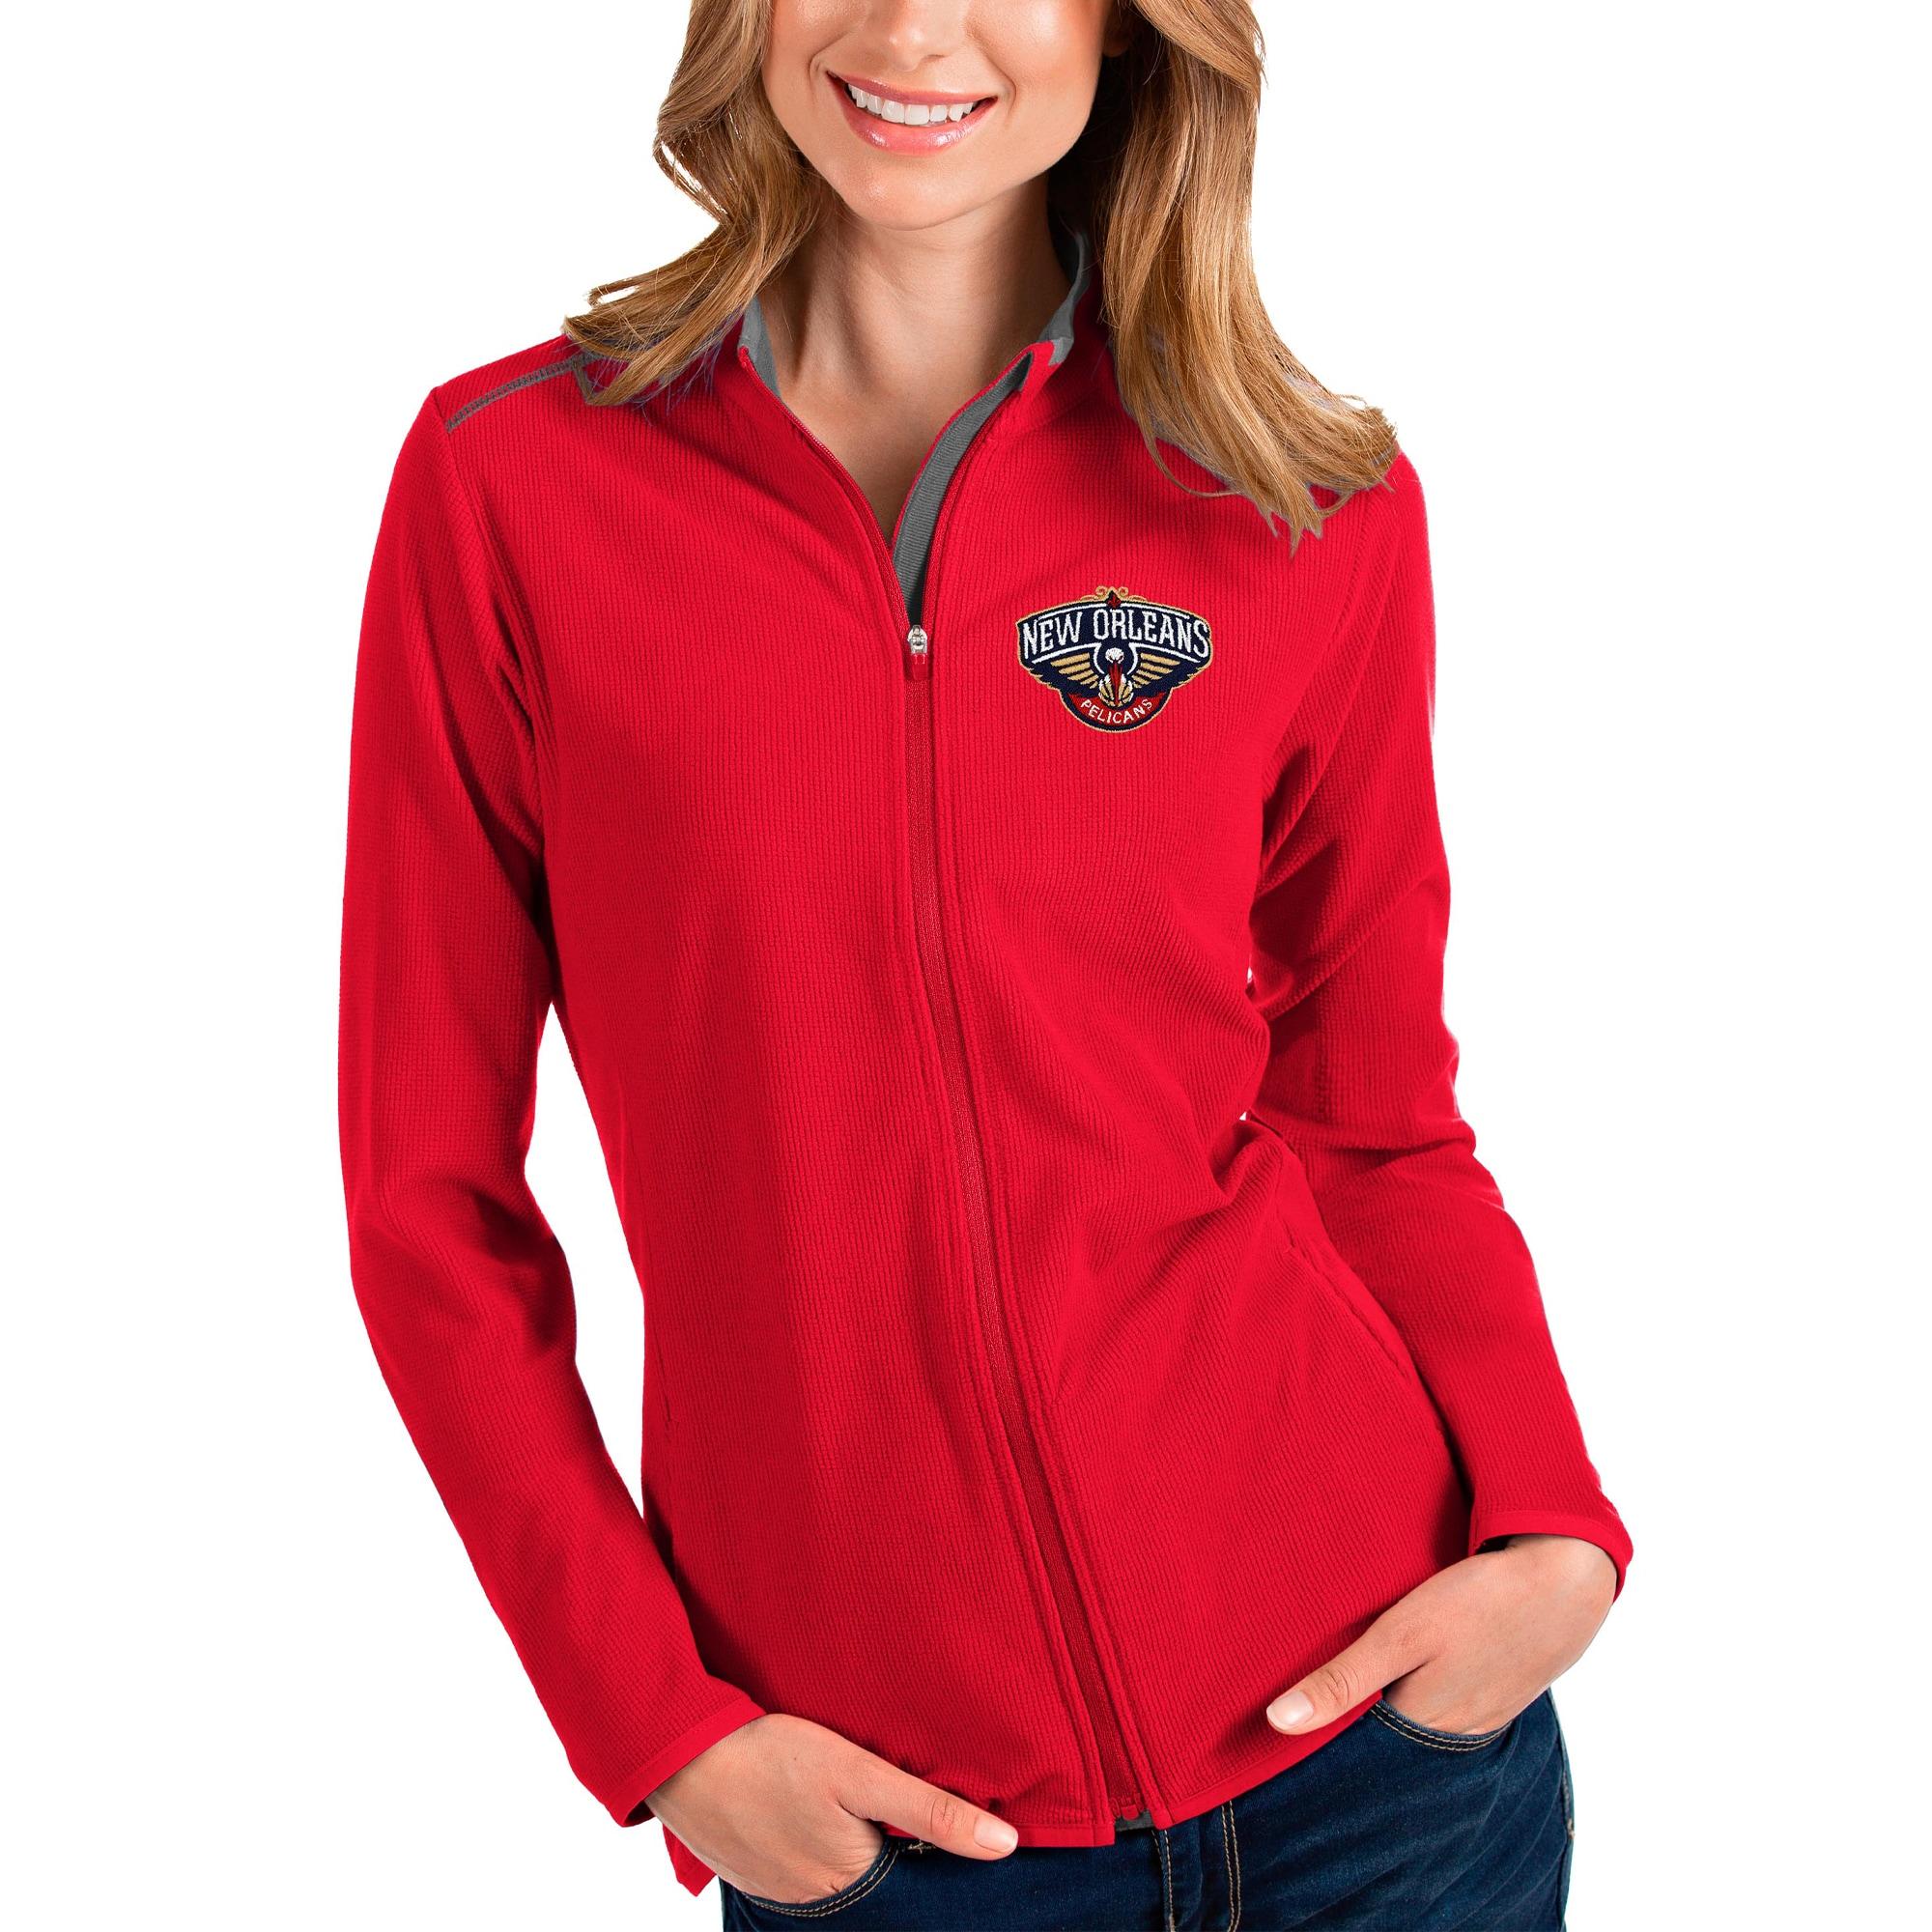 New Orleans Pelicans Antigua Women's Glacier Full-Zip Jacket - Red/Gray